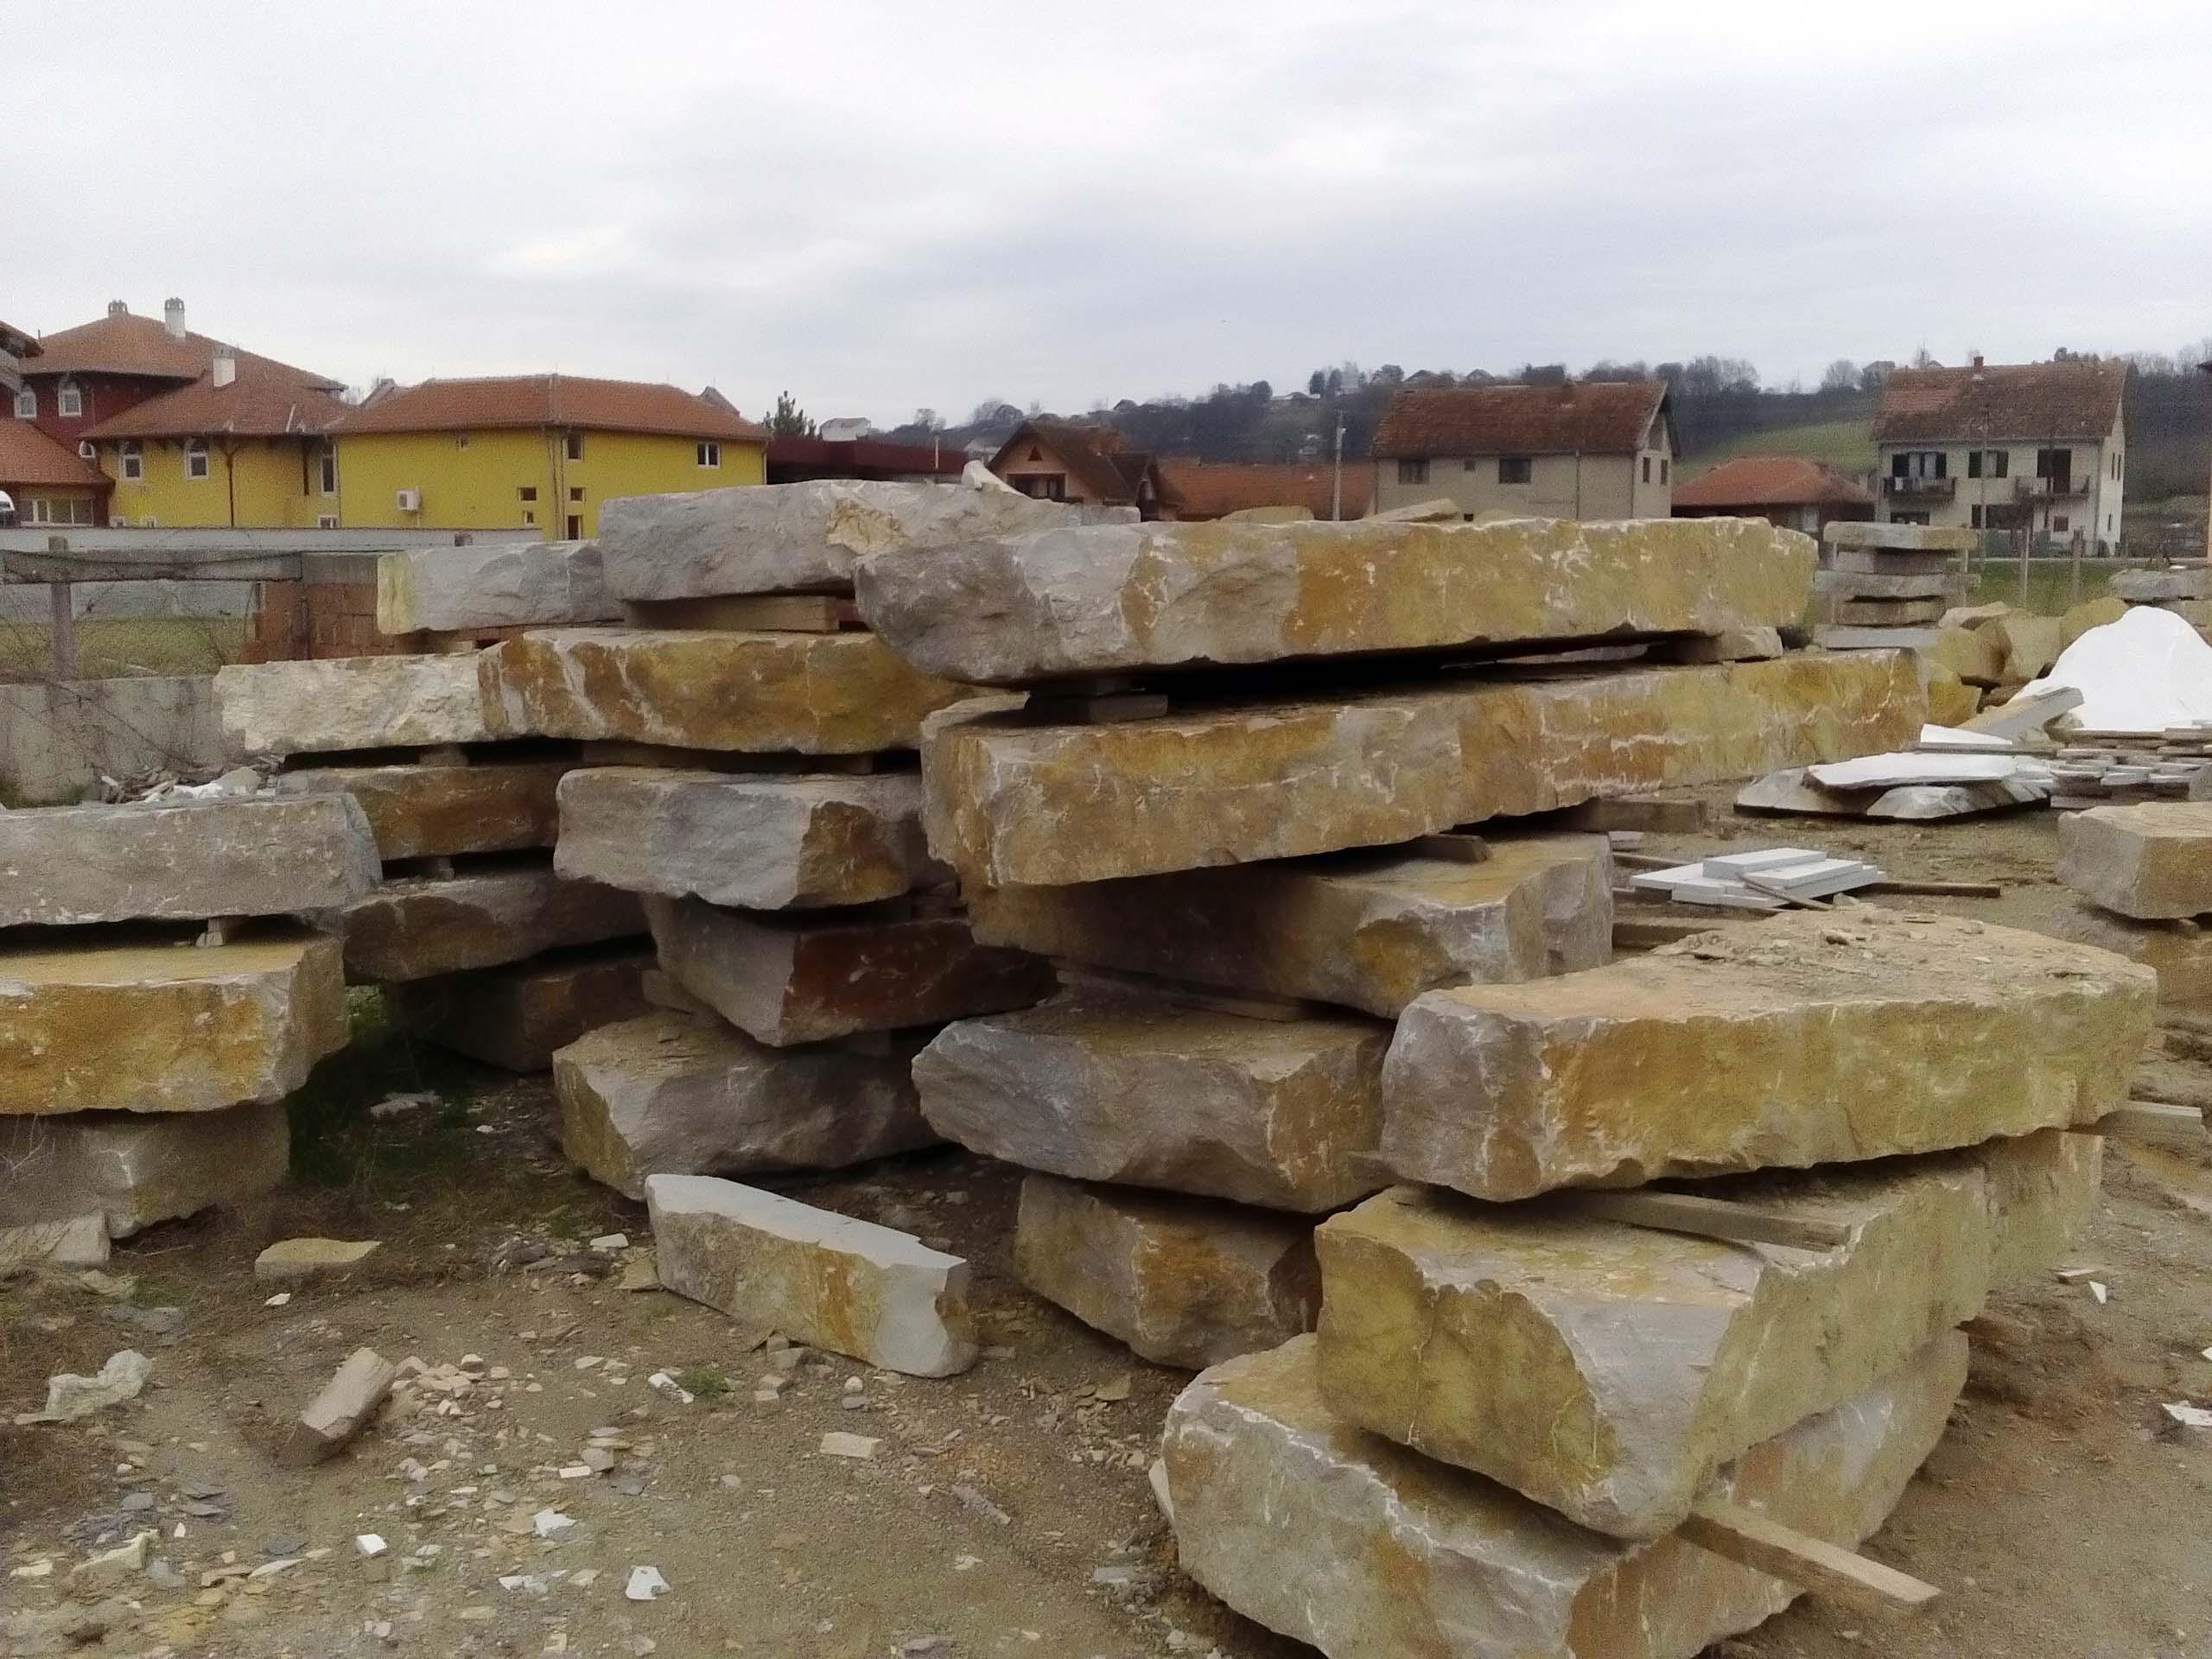 Vrste kamena, gaterisan i štokovan kamen 1